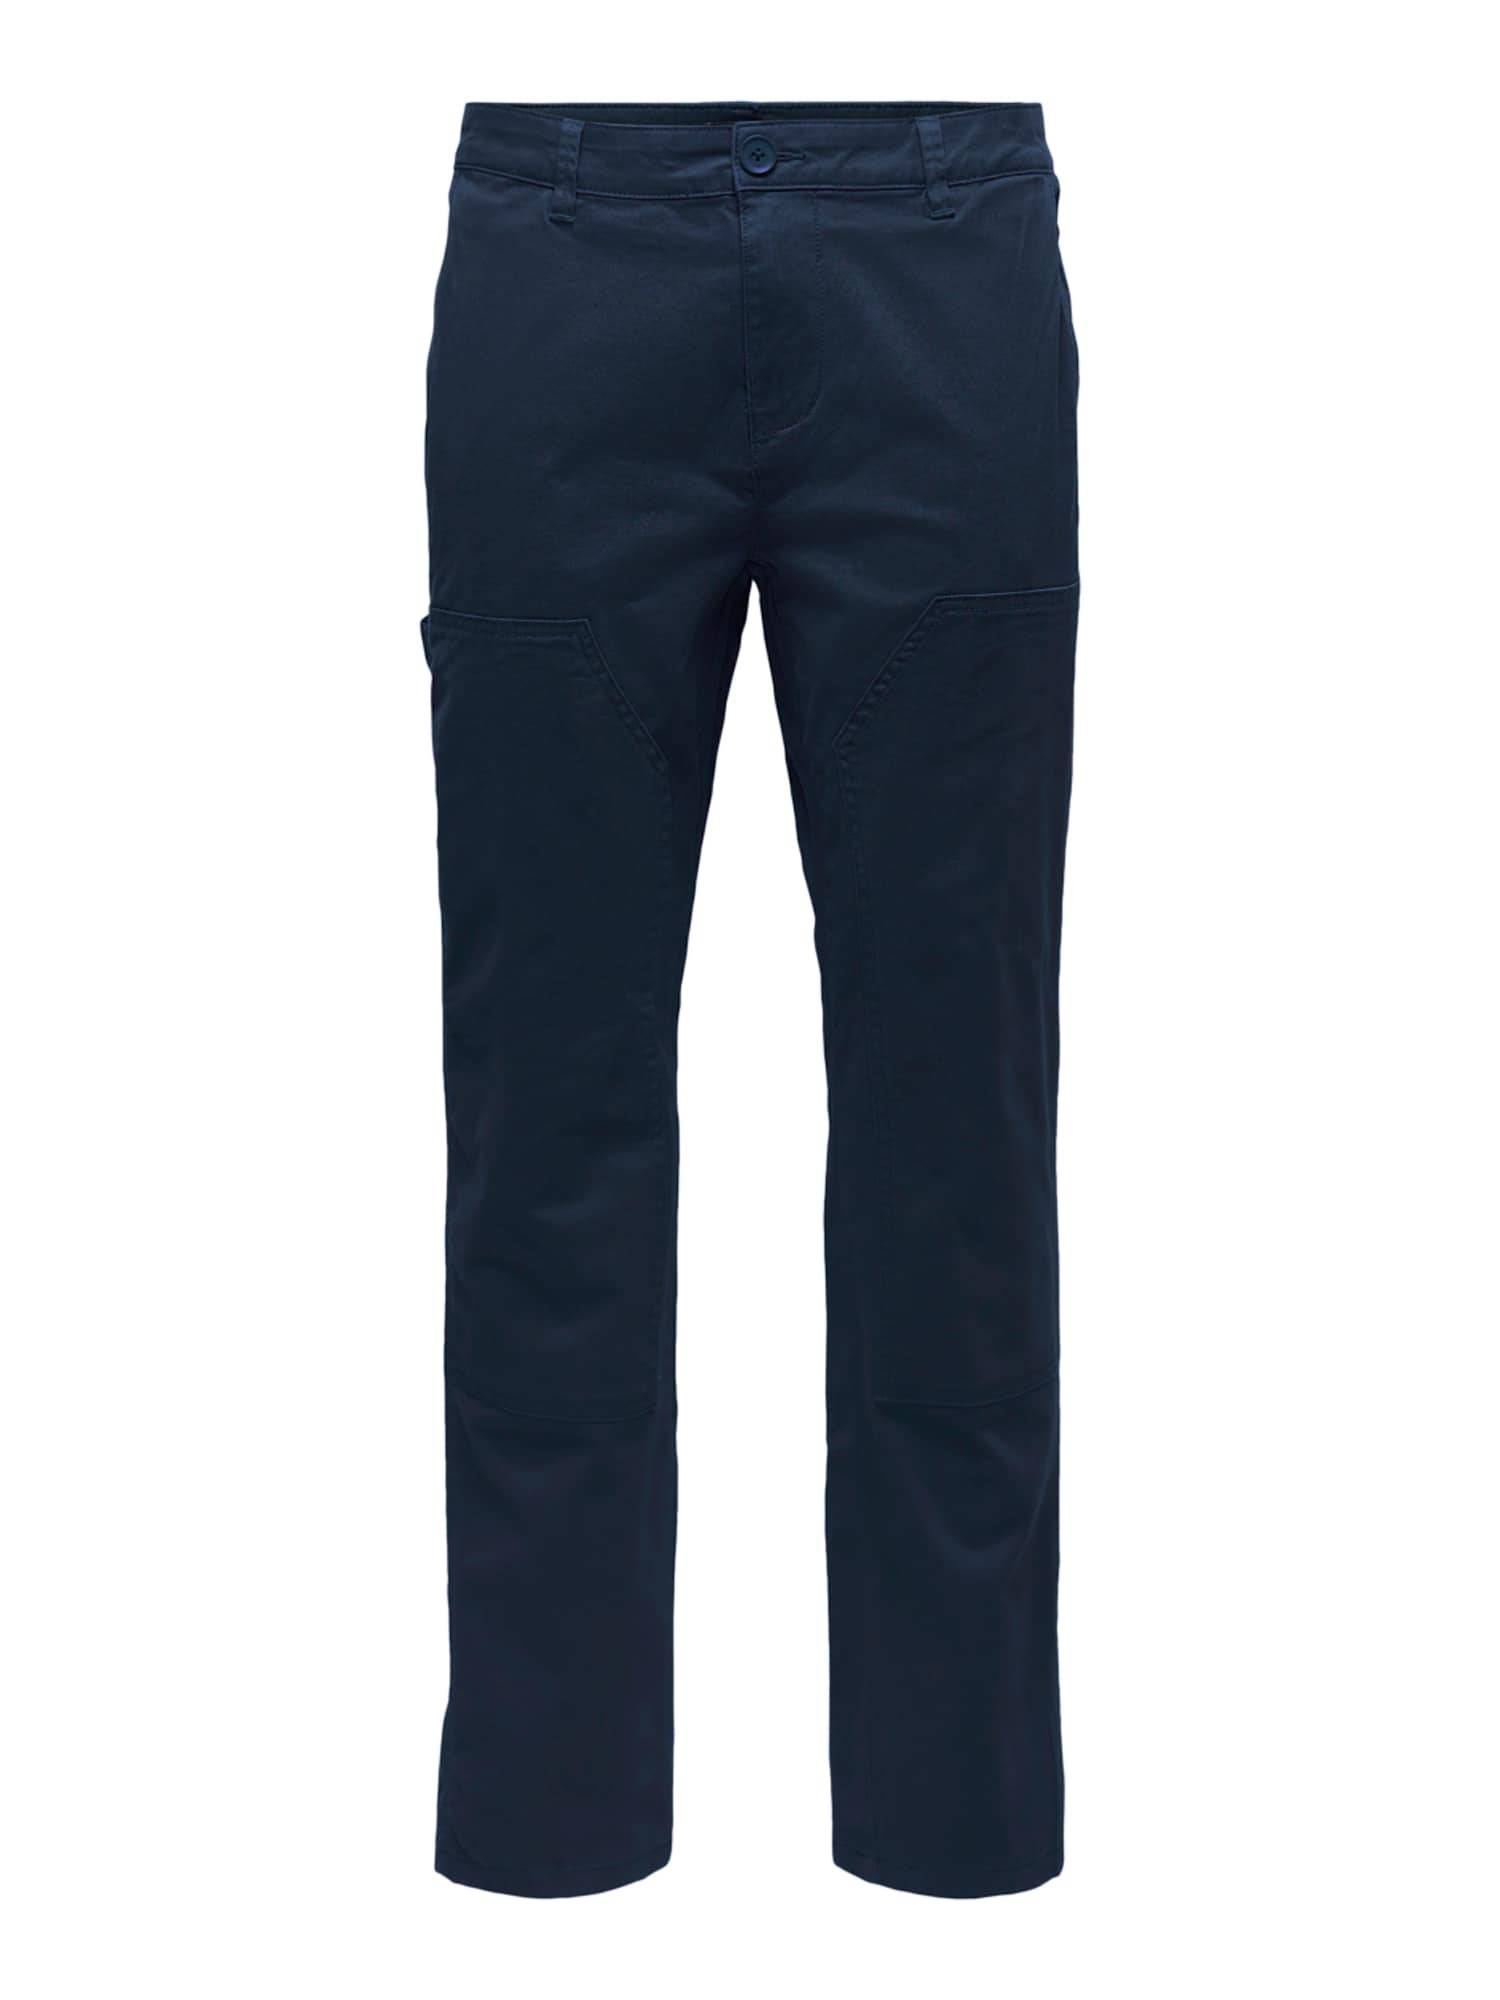 Only & Sons Pantalon 'Cam'  - Bleu - Taille: 29 - male